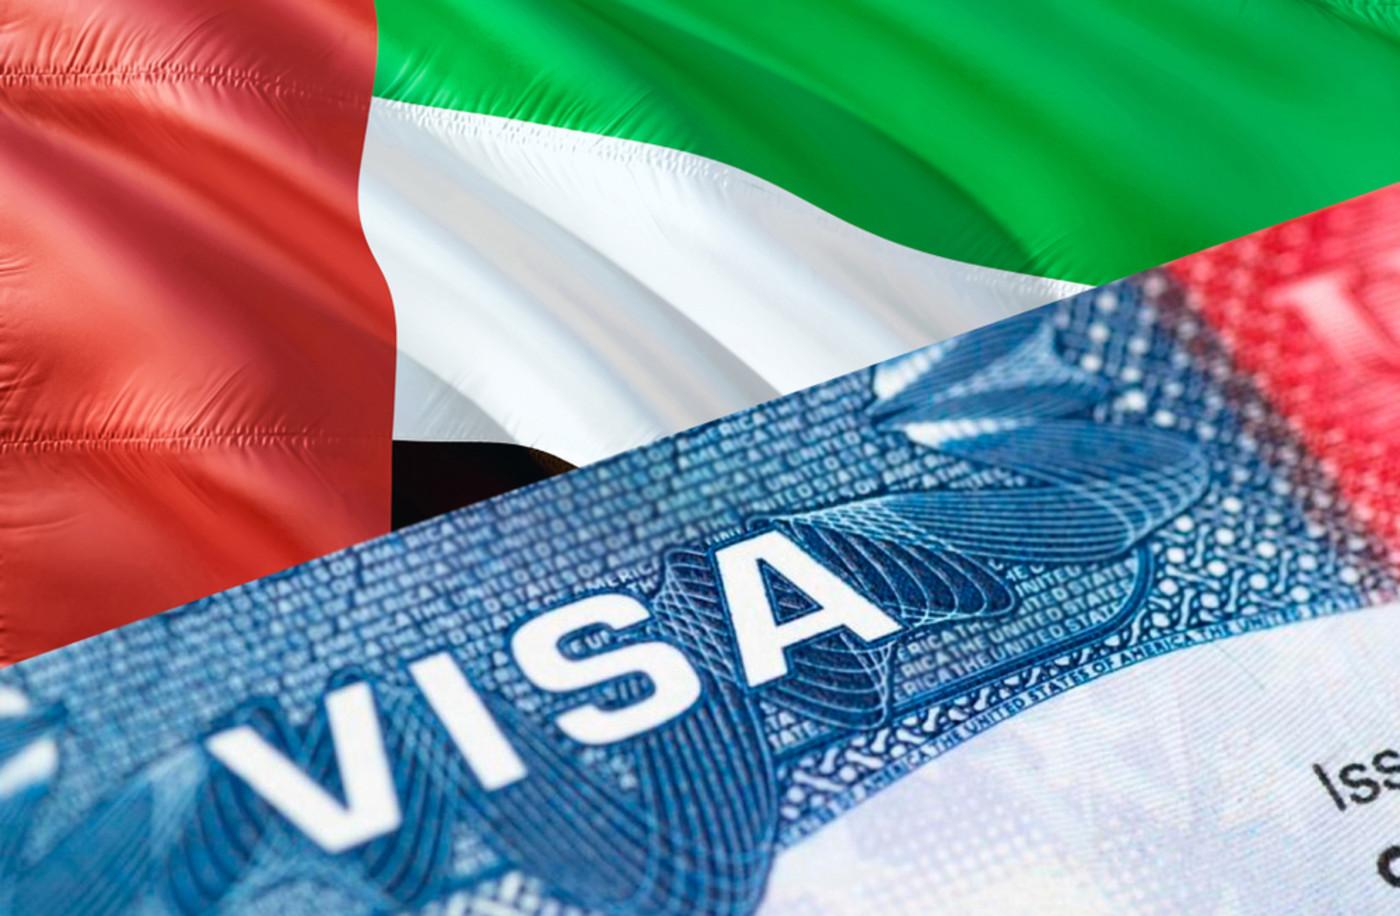 нужна ли виза для транзита через оаэ